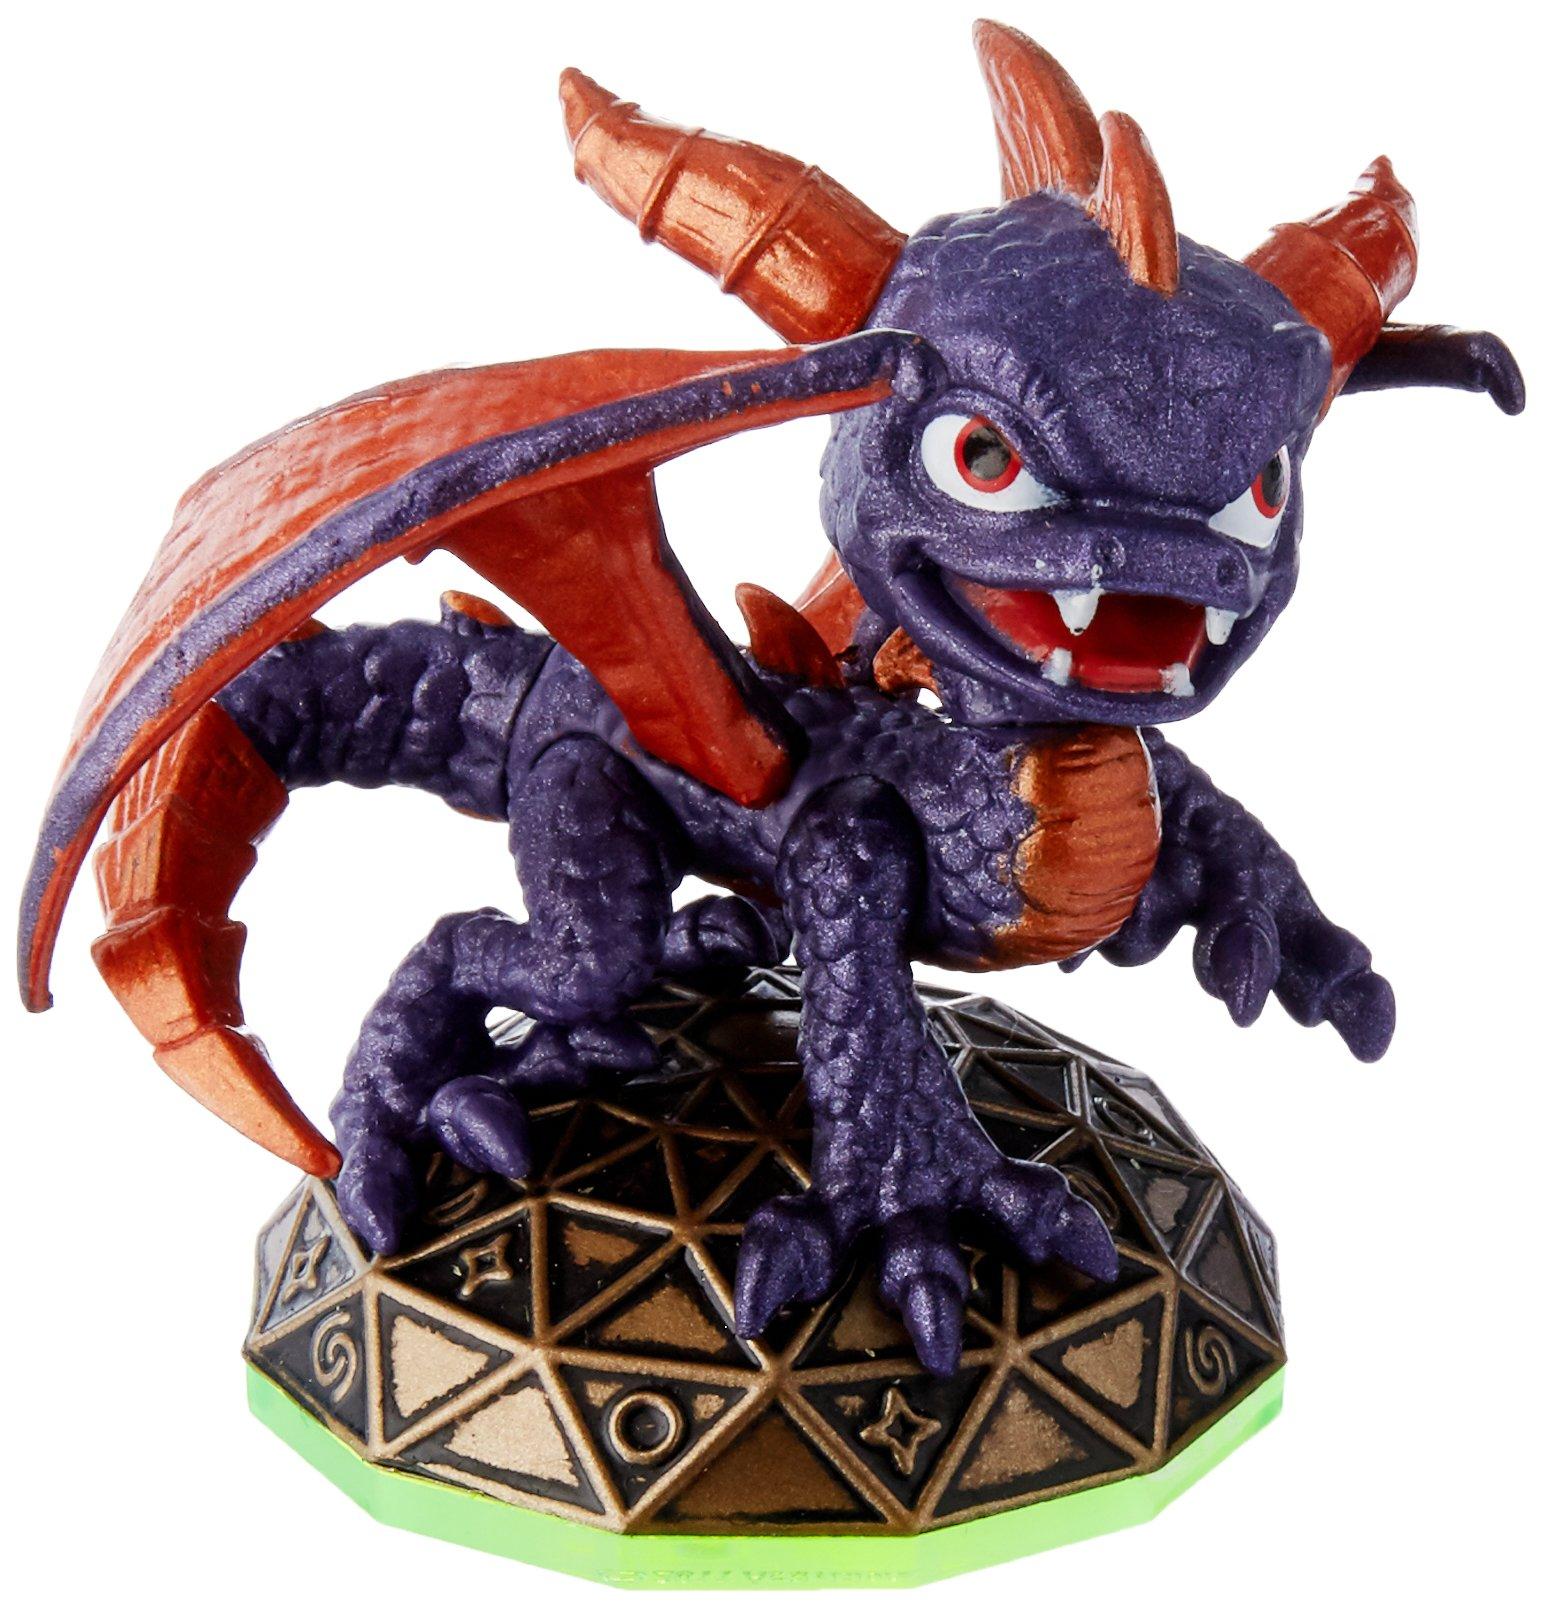 Skylanders Spyro's Adventure Spyro Dragon Series 1 Figure & Code